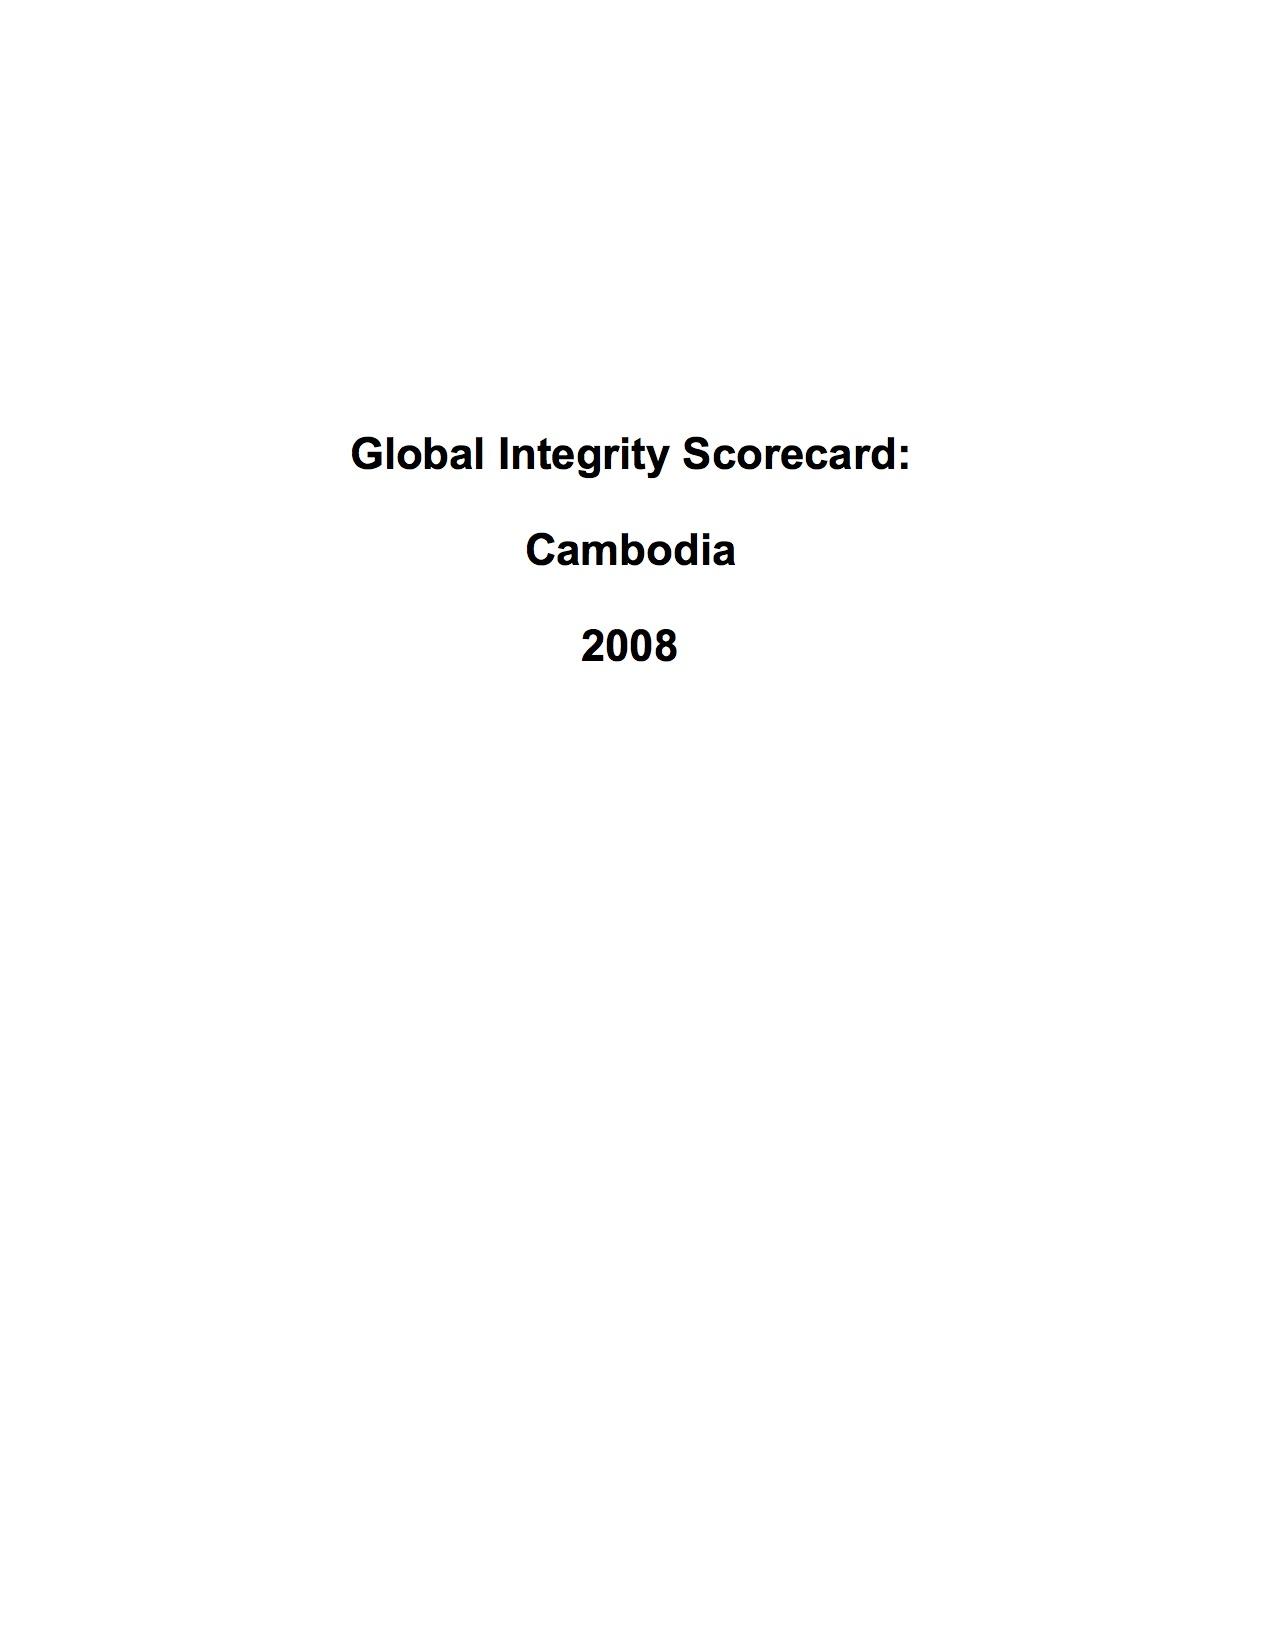 Politics and government archives page 16 of 17 ti cambodia global integrity scorecard cambodia 2008 malvernweather Gallery